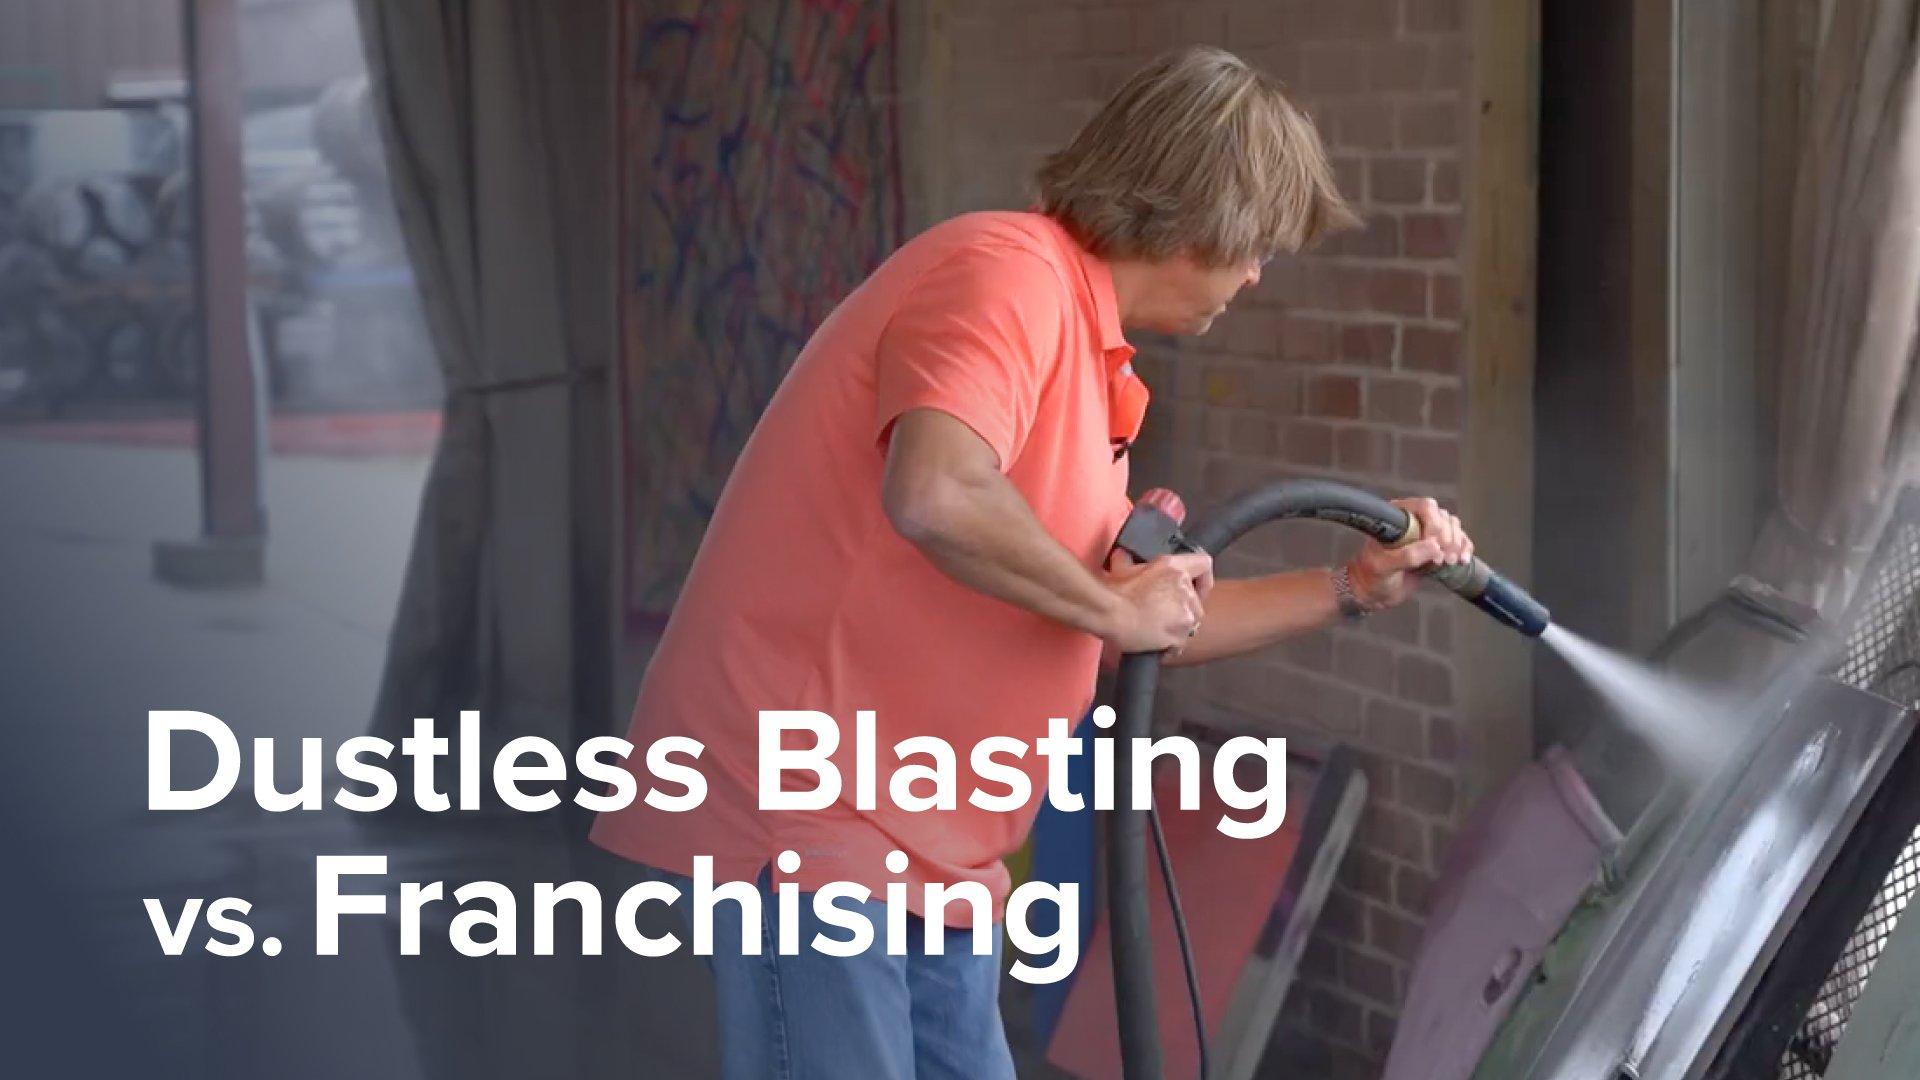 Dustless-Blasting-VS-a-Franchise!-thumbnail-words